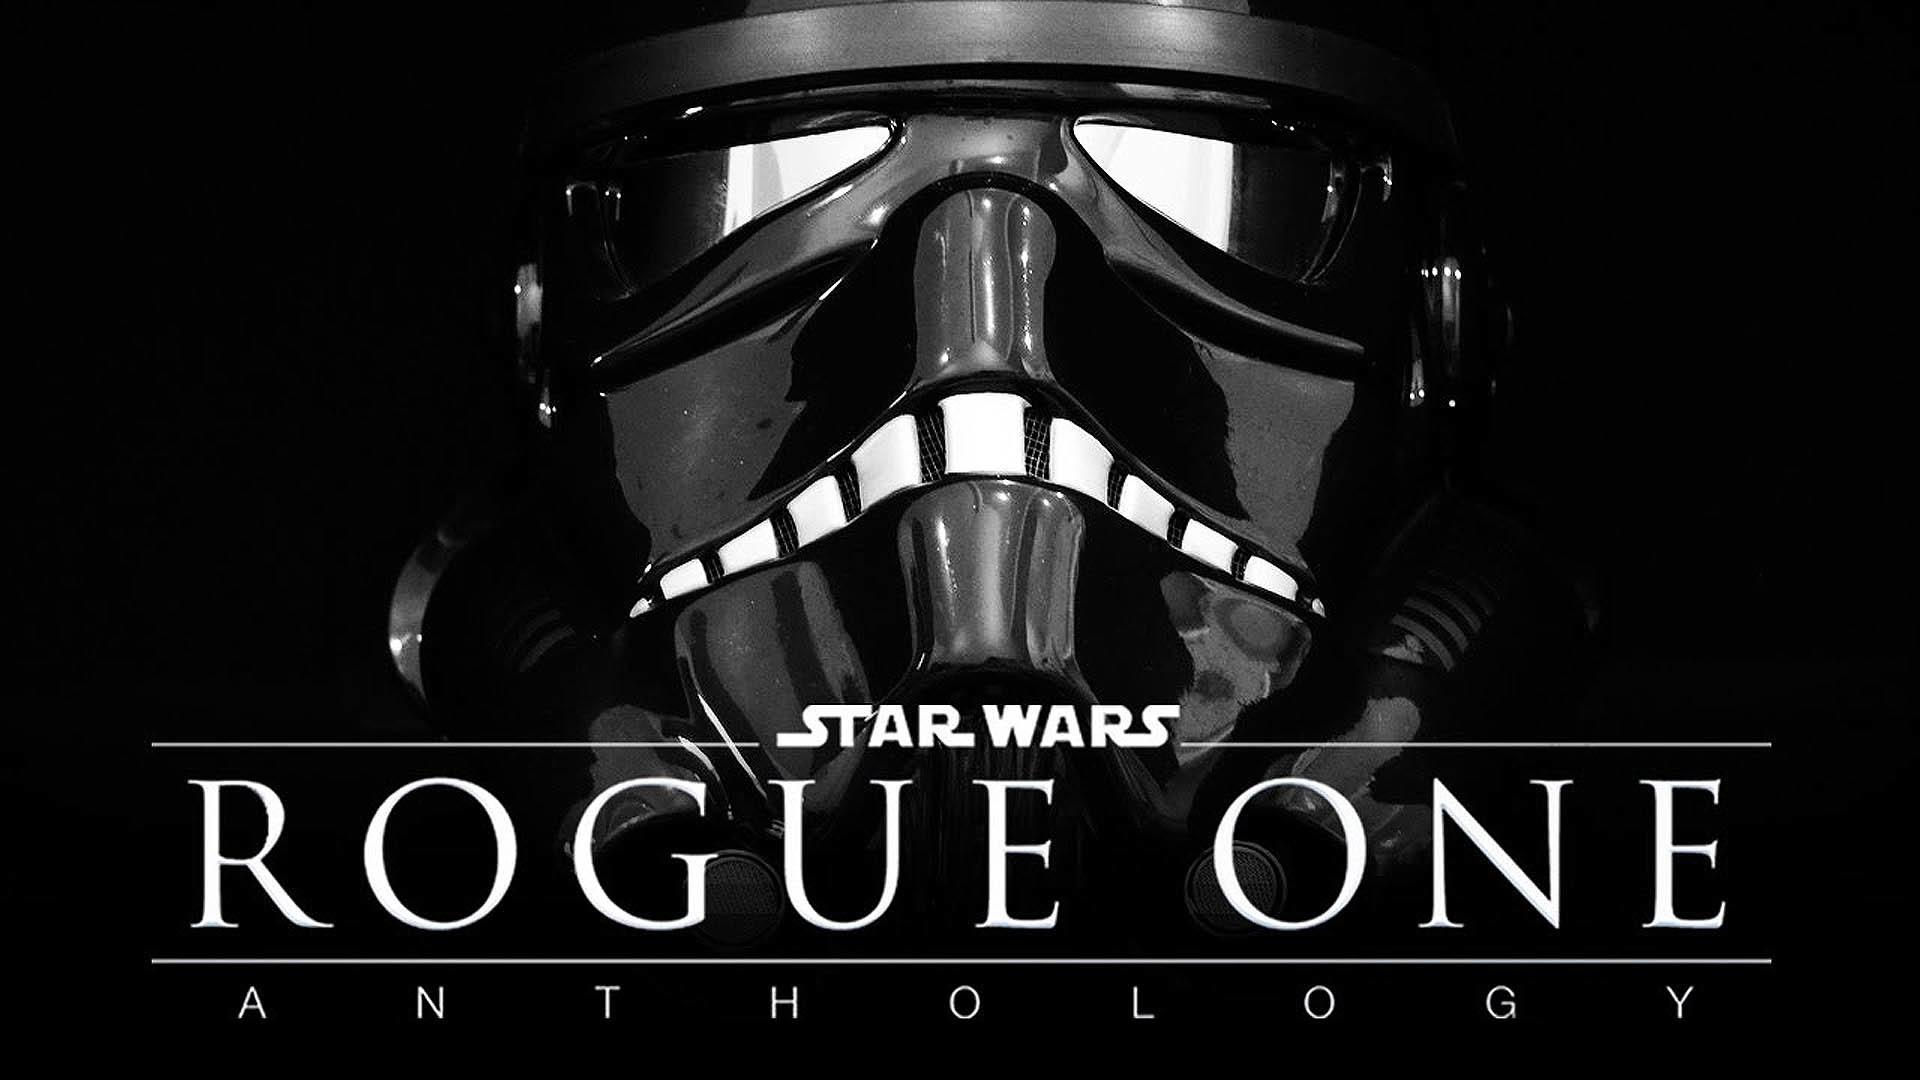 Star Wars Rogue One – Shadow Stormtrooper wallpaper